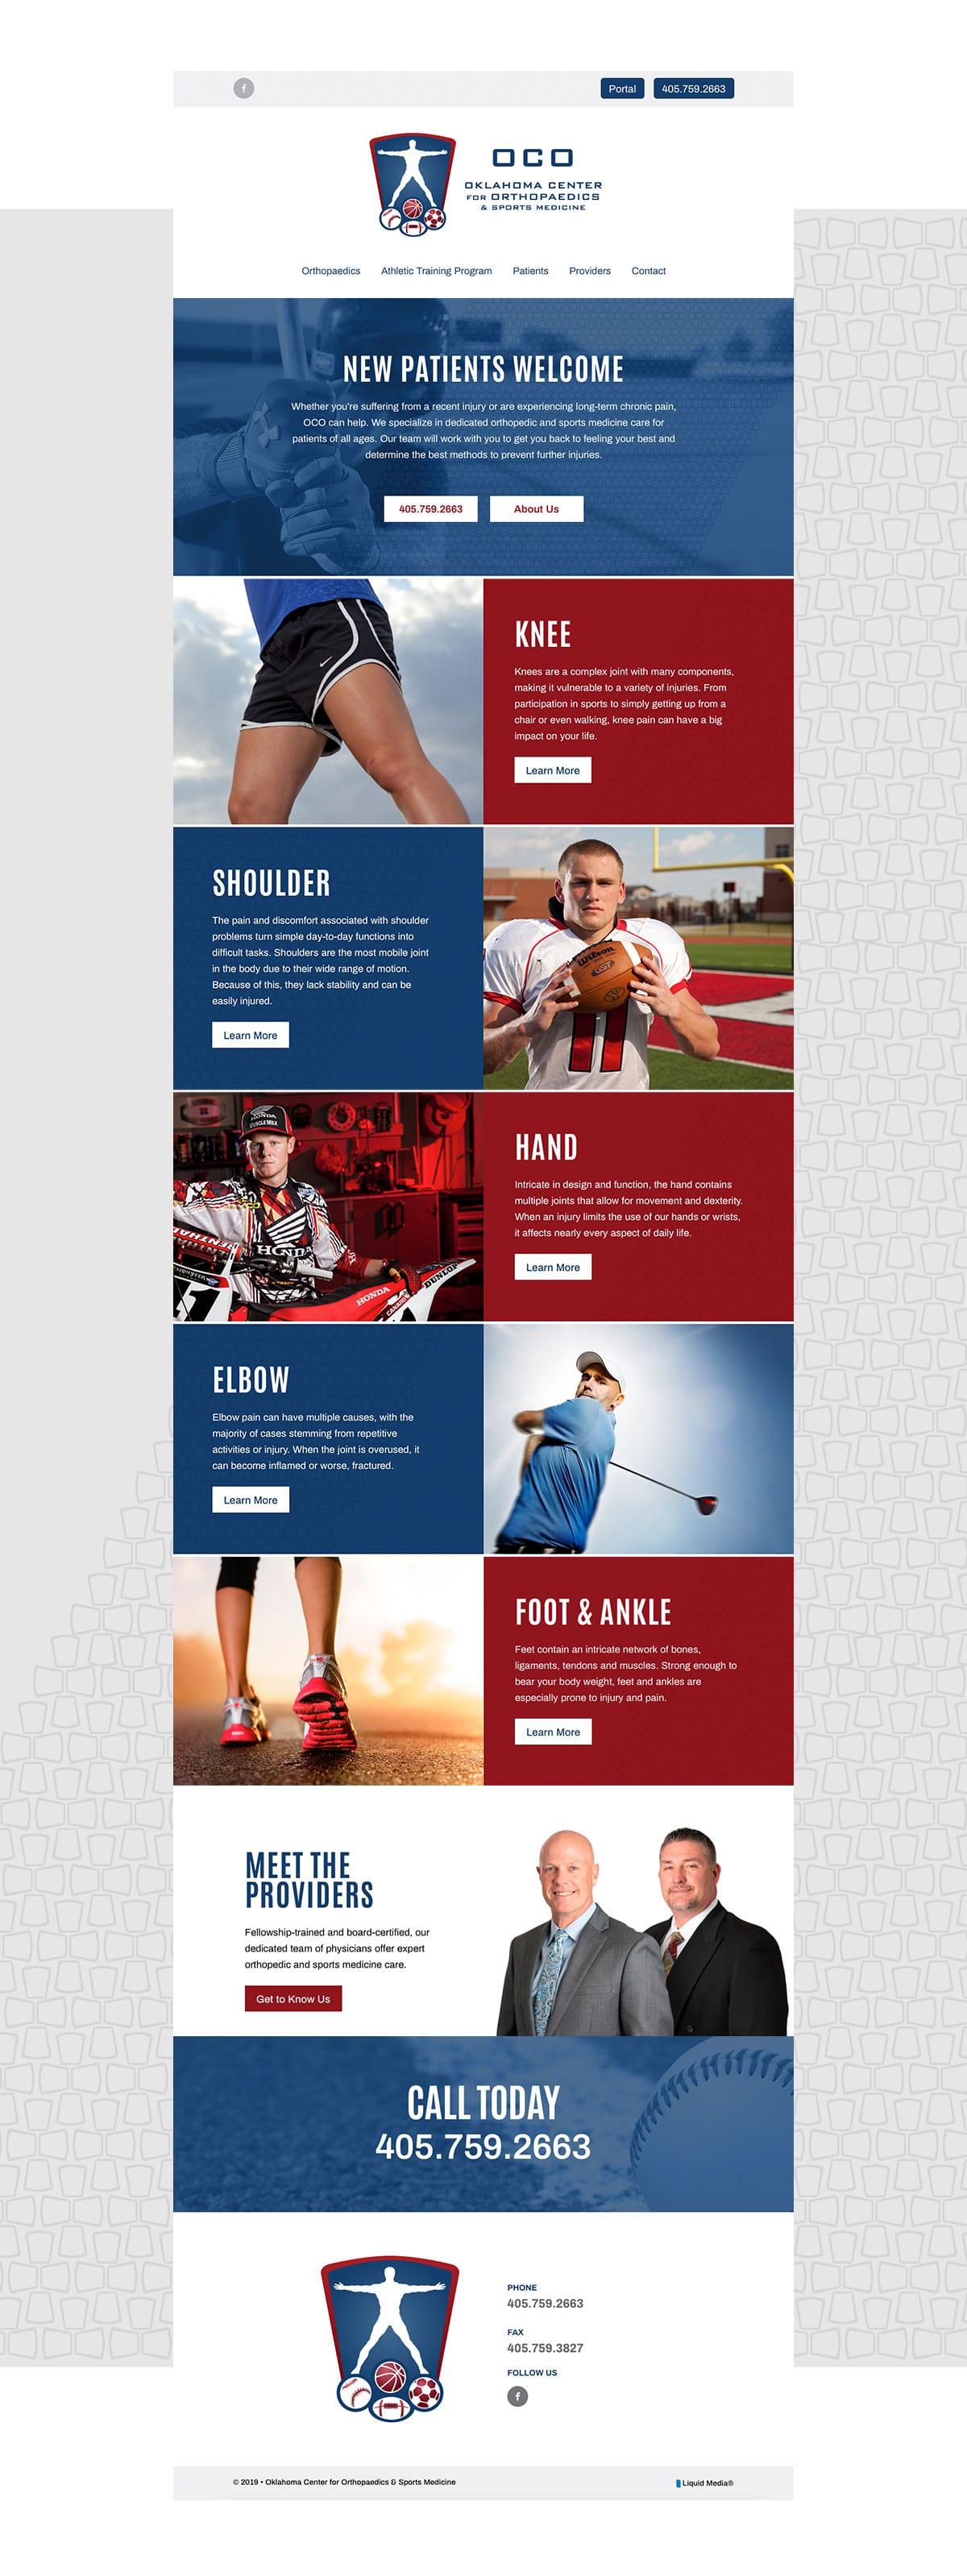 OCO Sports Website Development & Design by Liquid Media